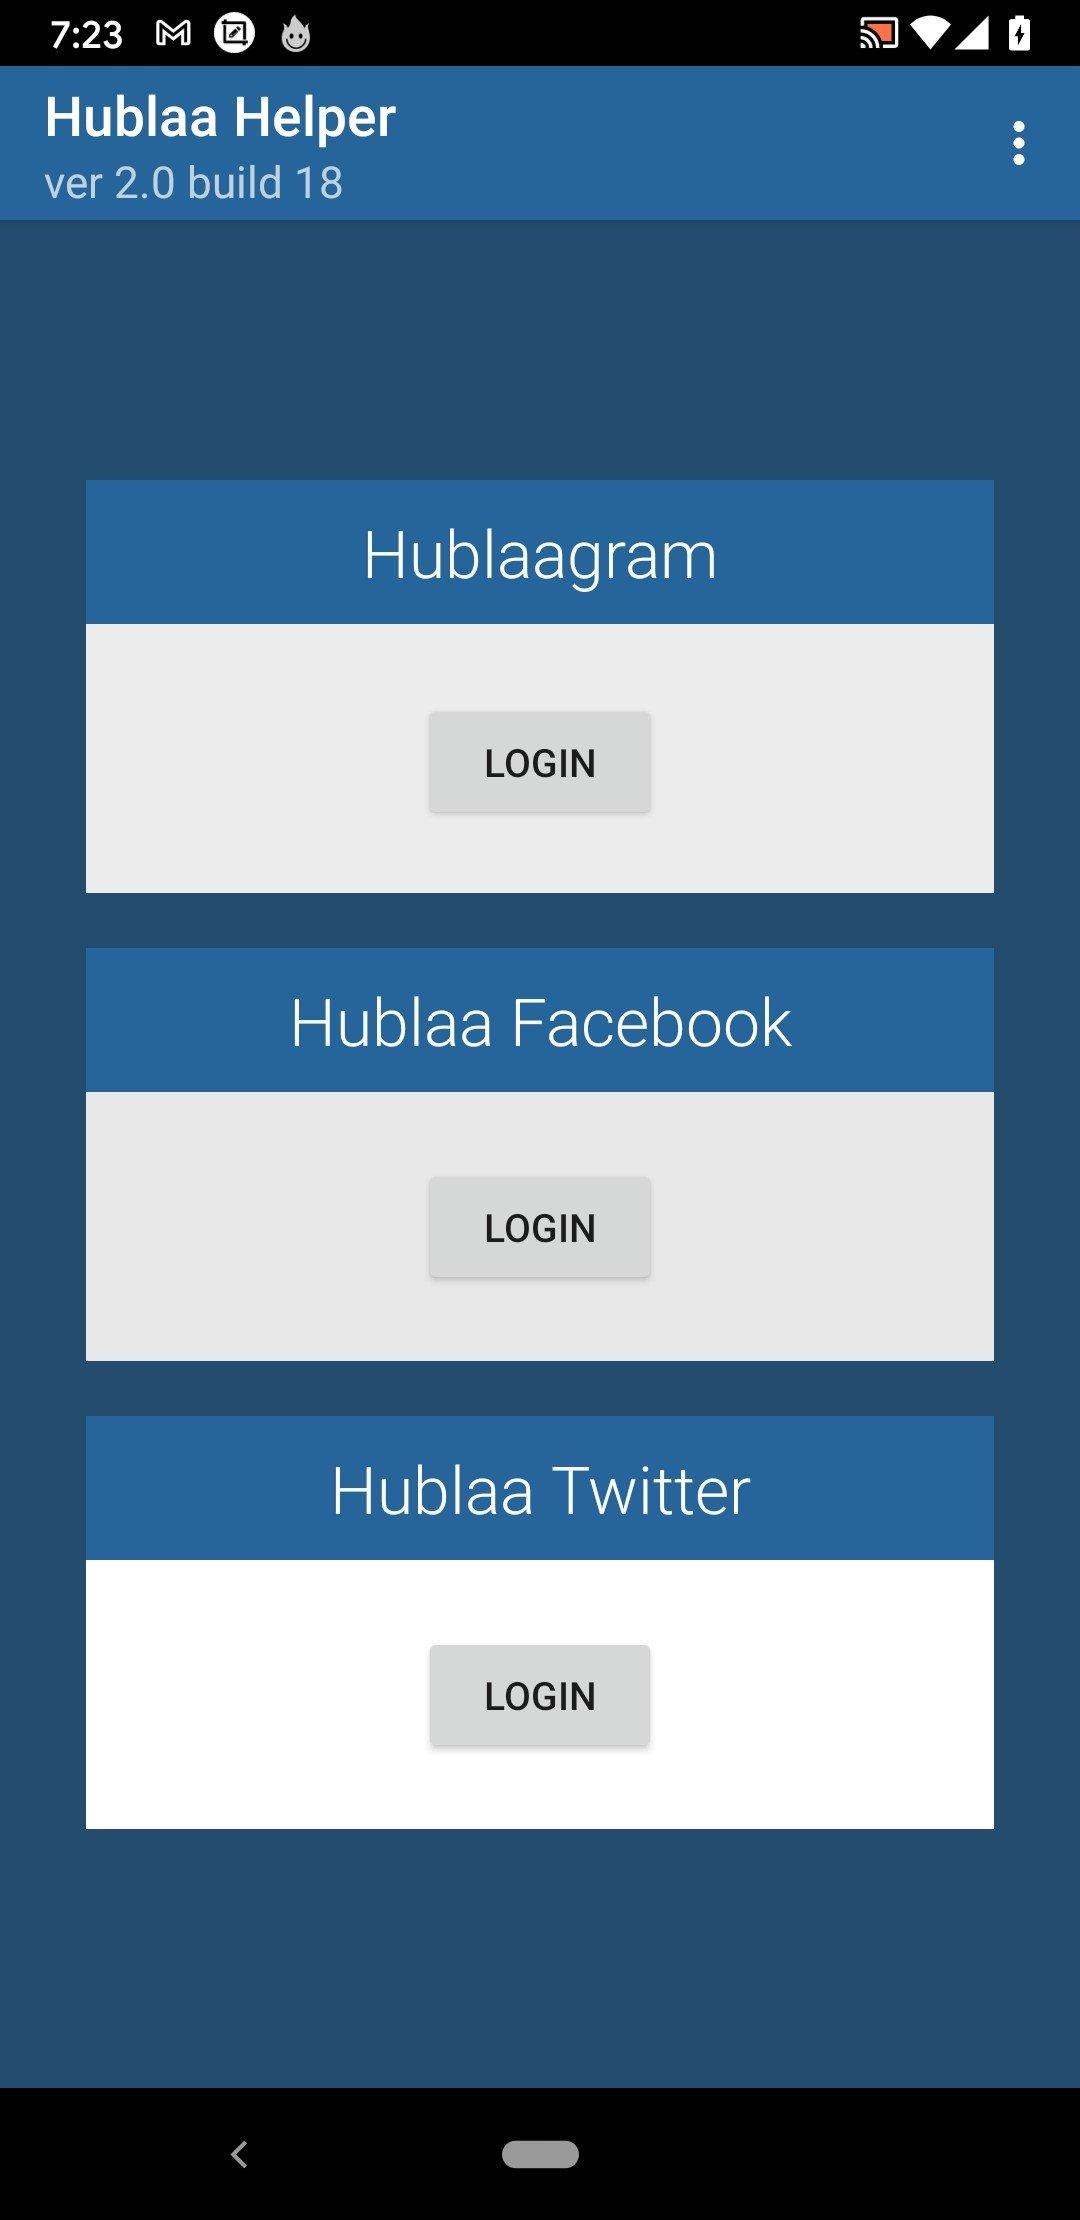 Hublaagram Android image 6